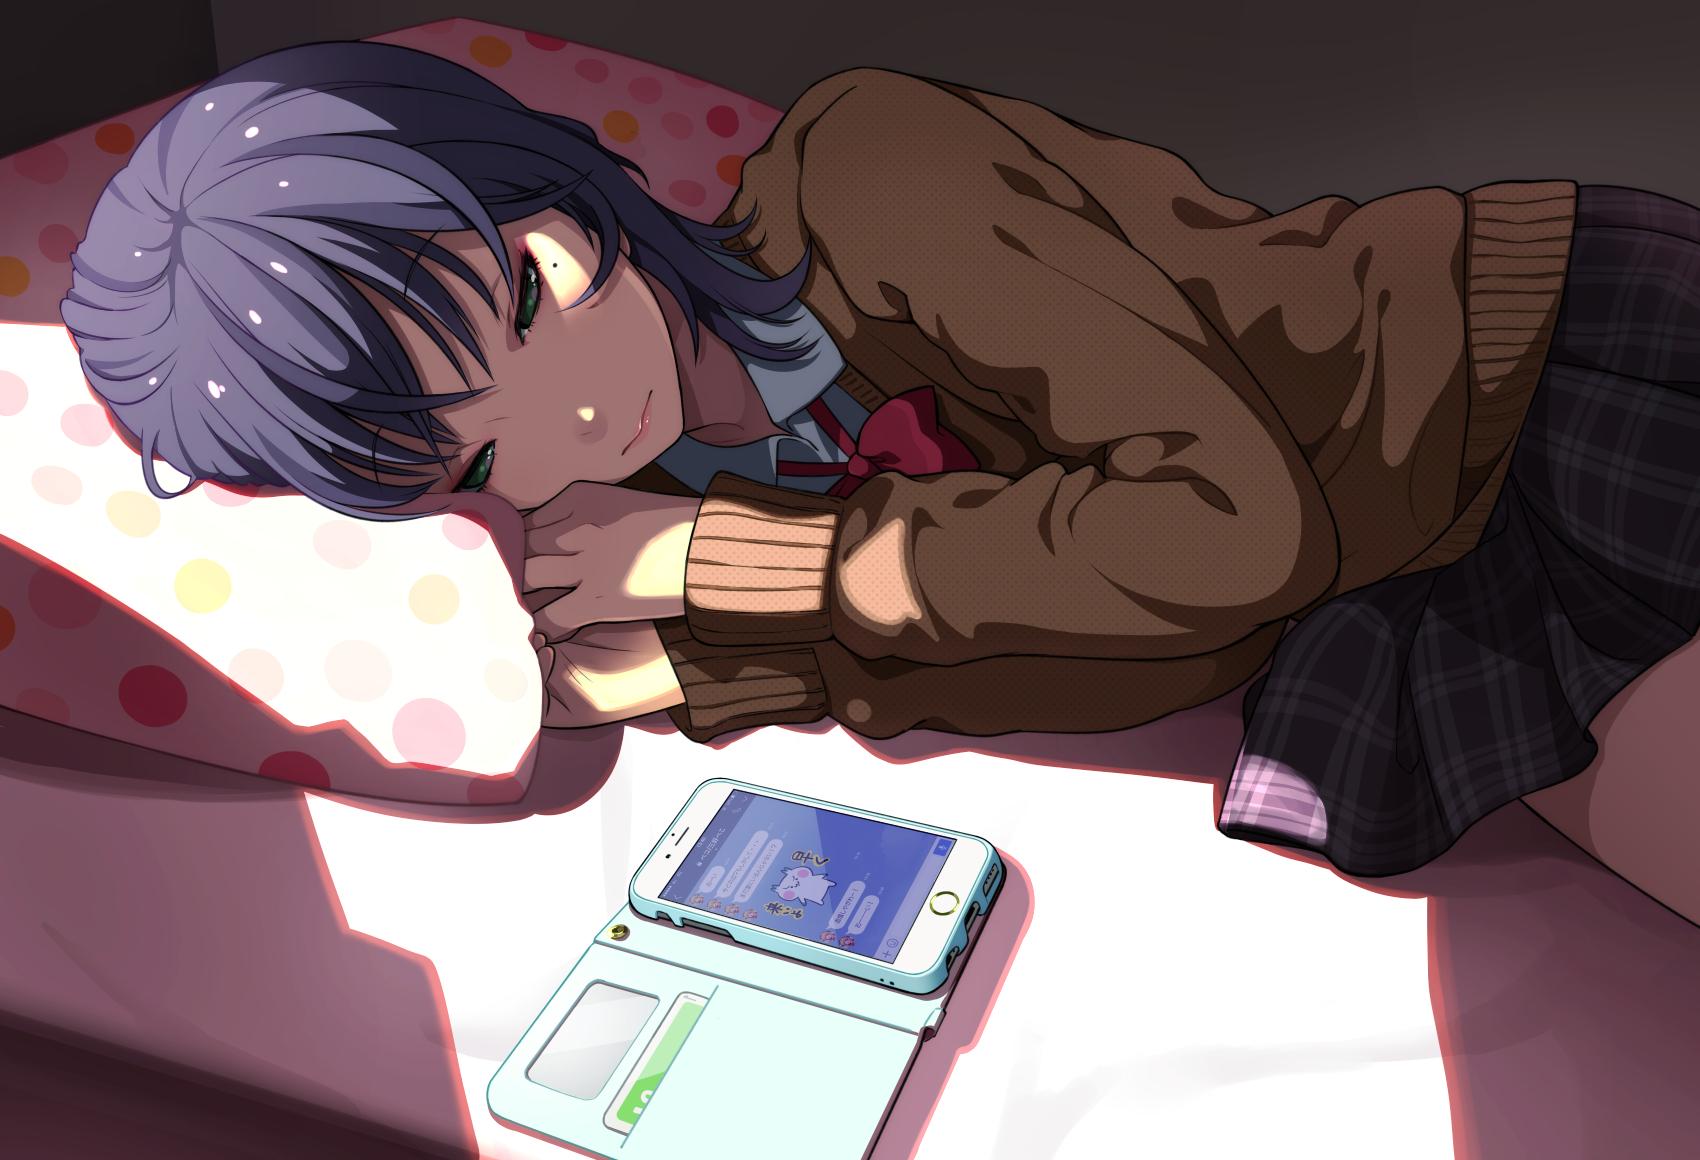 Anime 1700x1160 anime anime girls in bed green eyes smartphone sweater purple hair pillow light effects shoulder length hair school uniform LAM